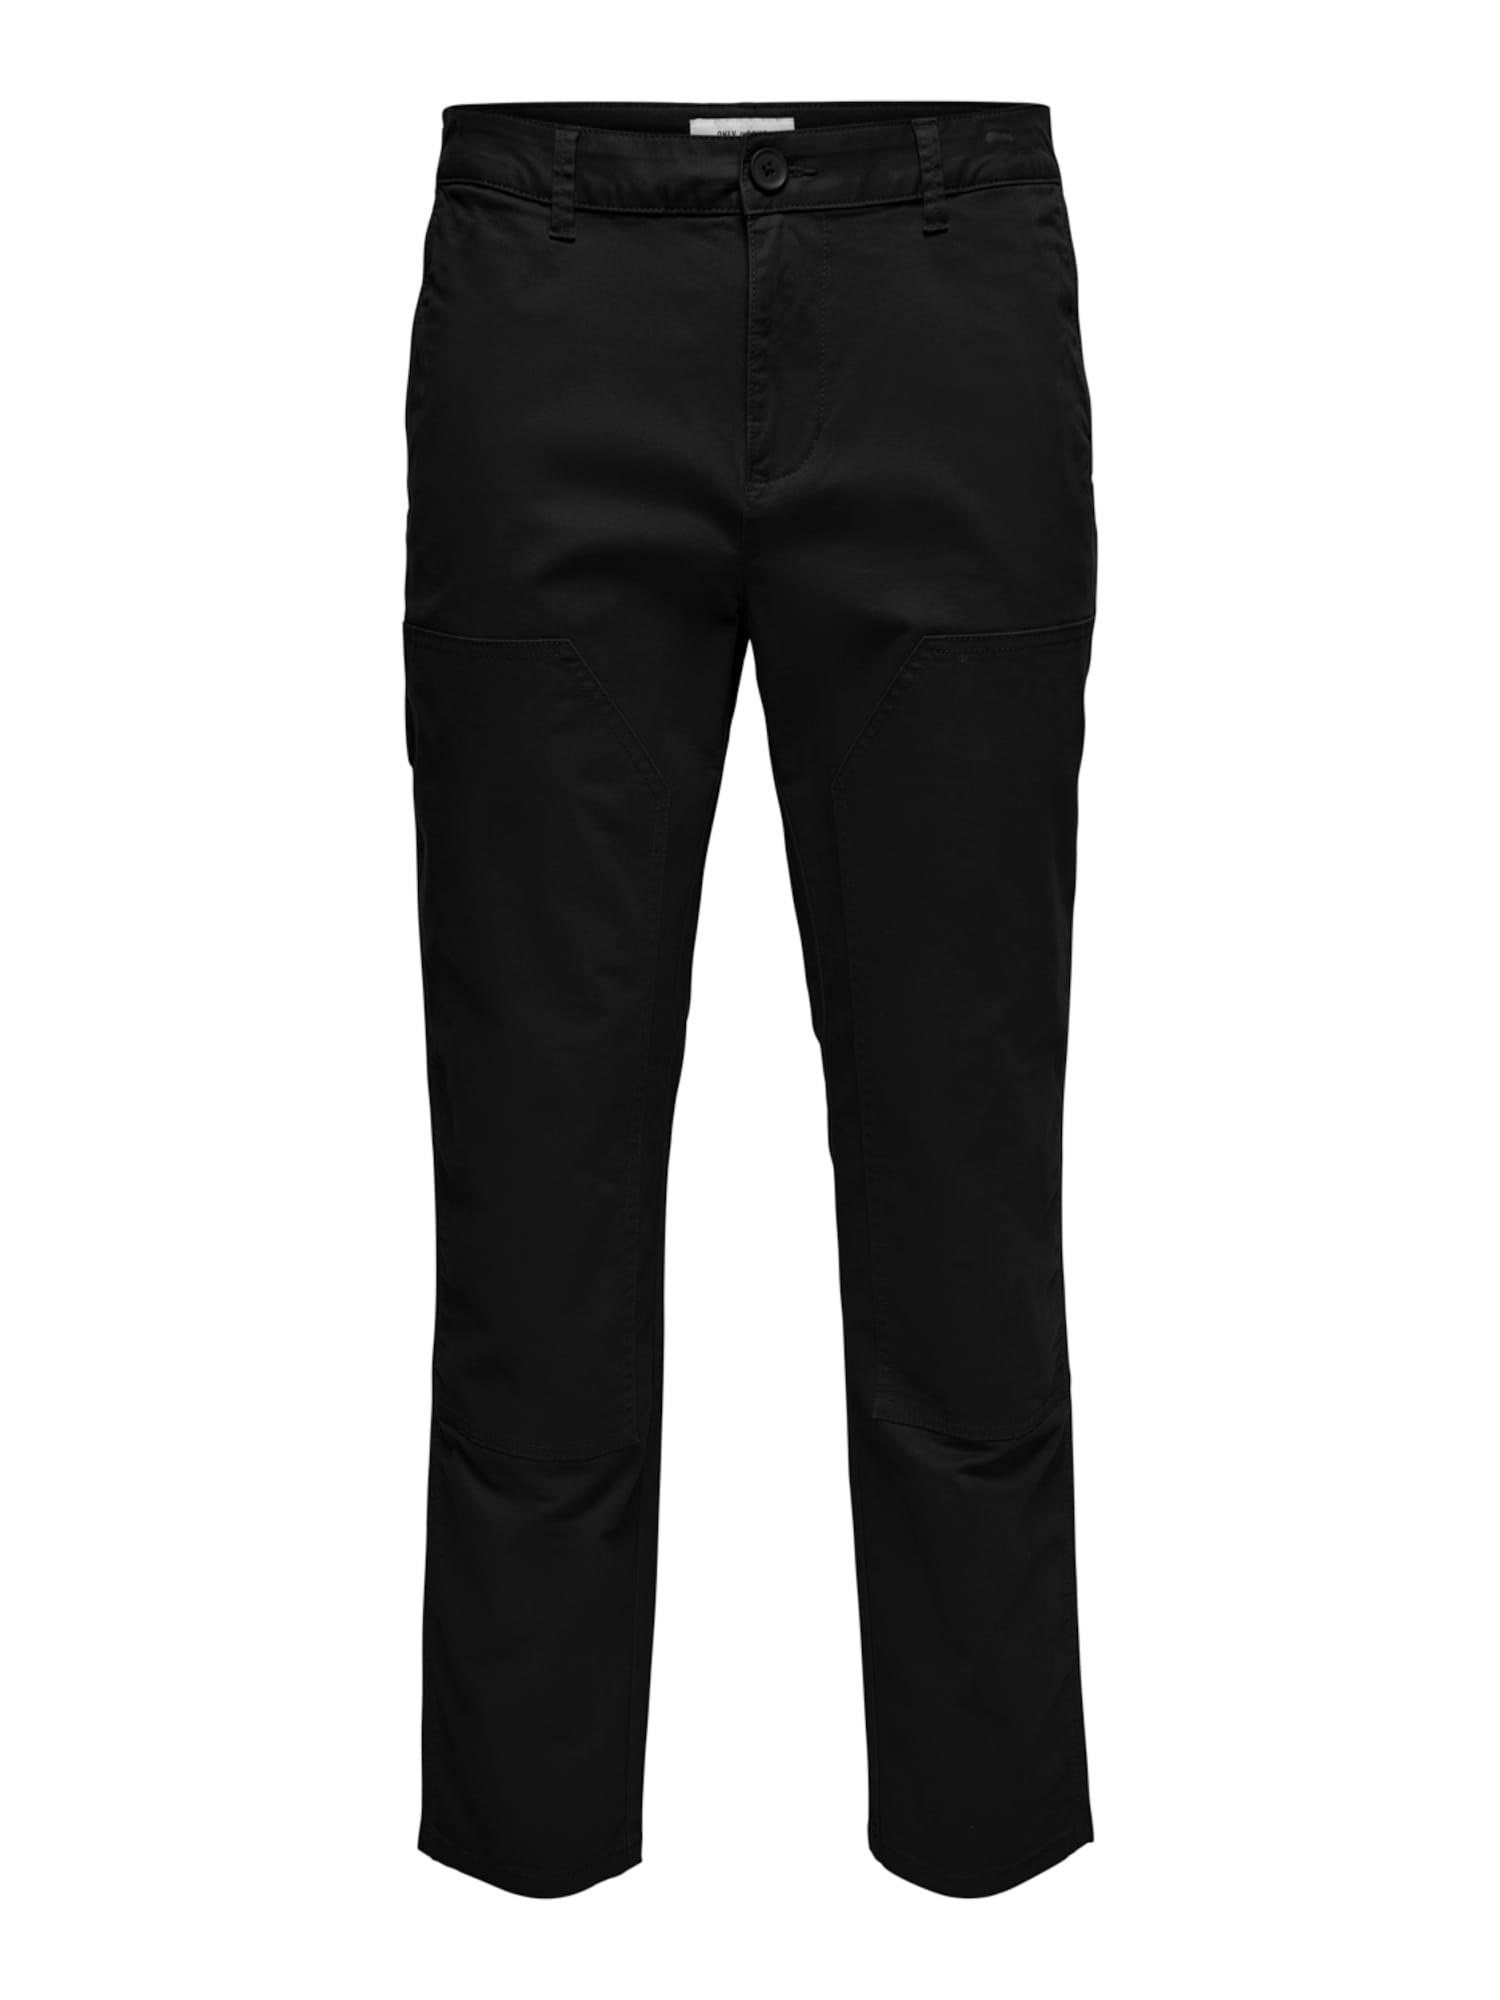 Only & Sons Pantalon 'Cam'  - Noir - Taille: 29 - male